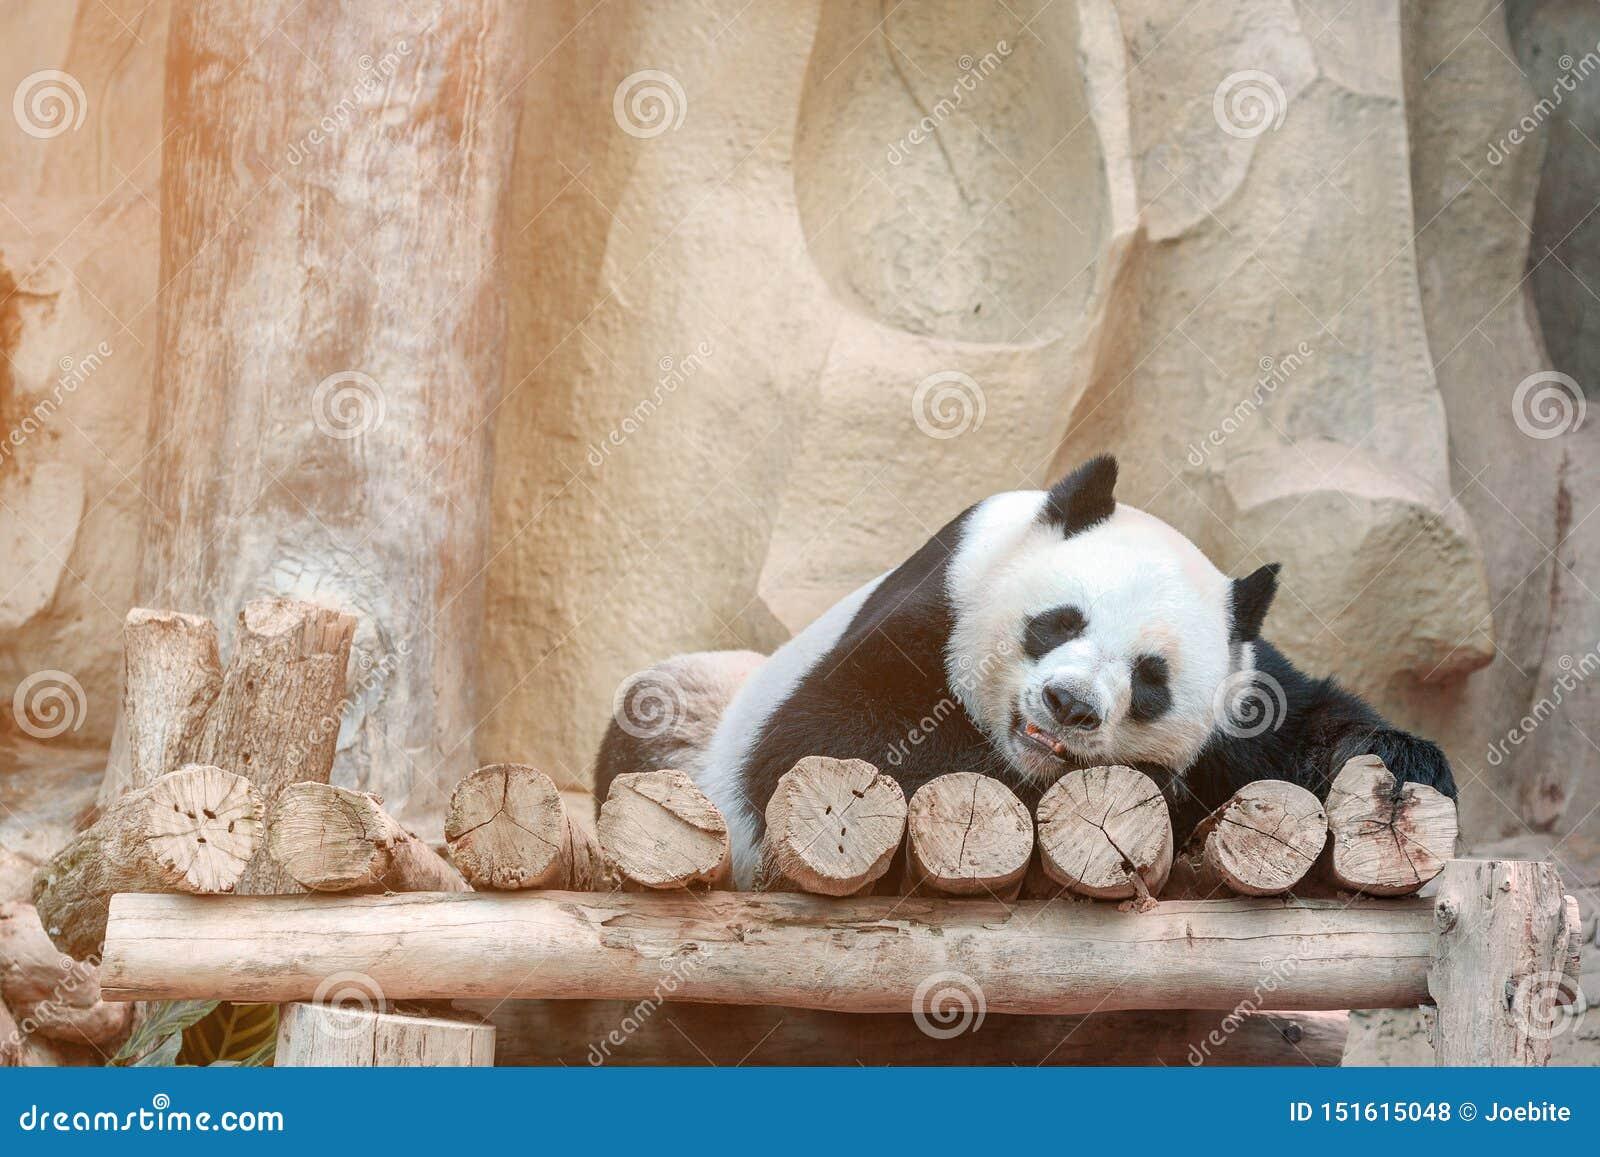 Cute giant panda or Ailuropoda melanoleuca enjoy playing at the zoo. Adorable big bear with beautiful fur.